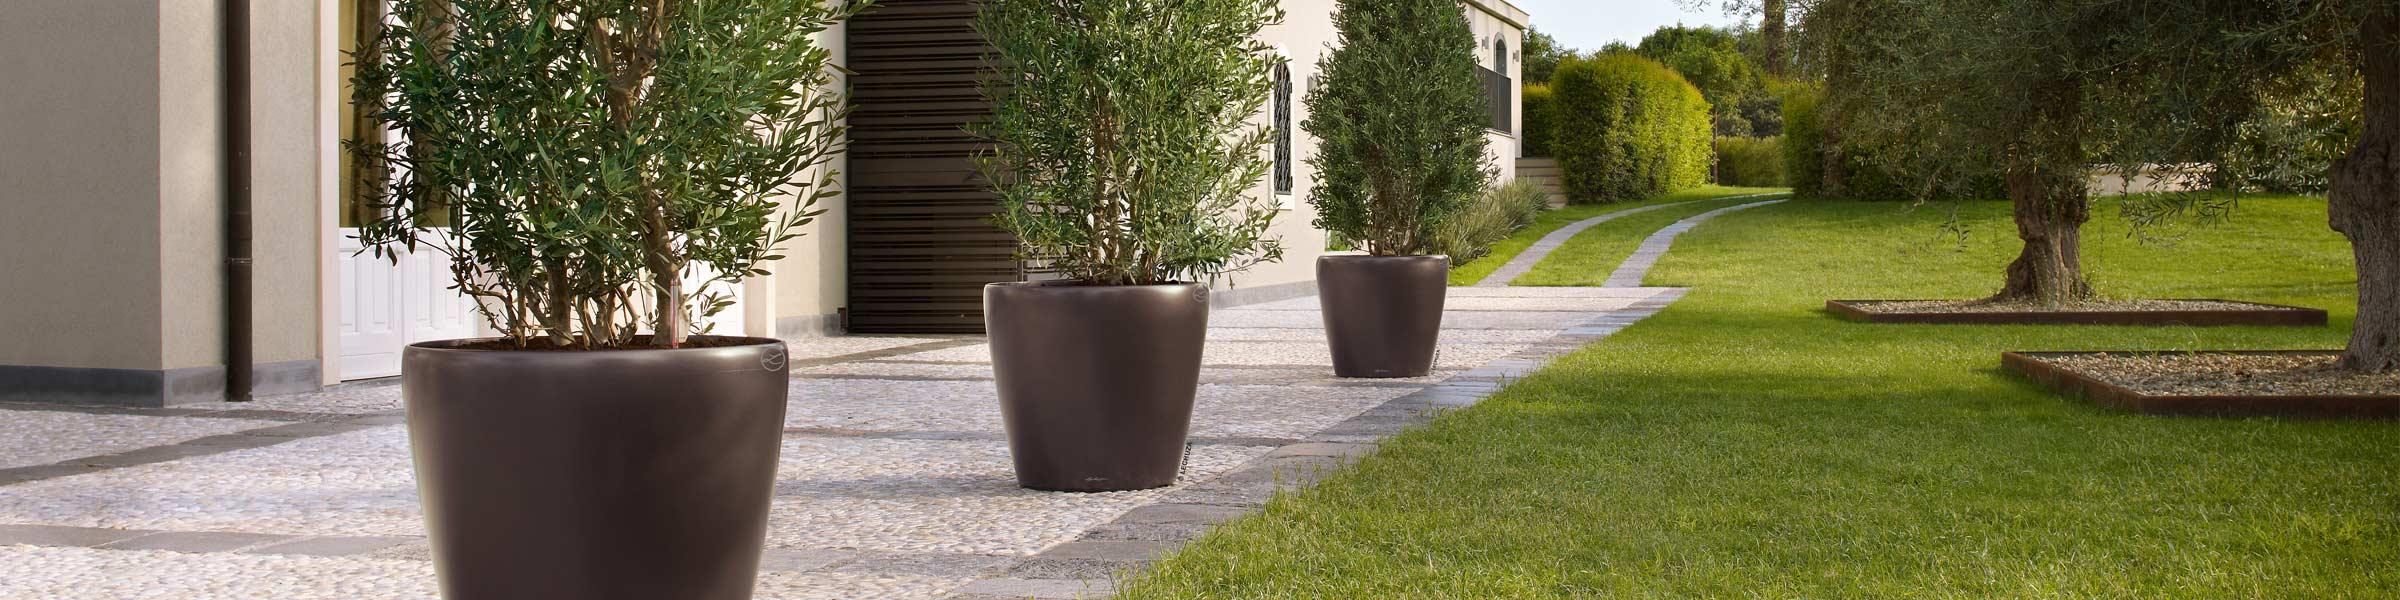 Terrassenpflanzen